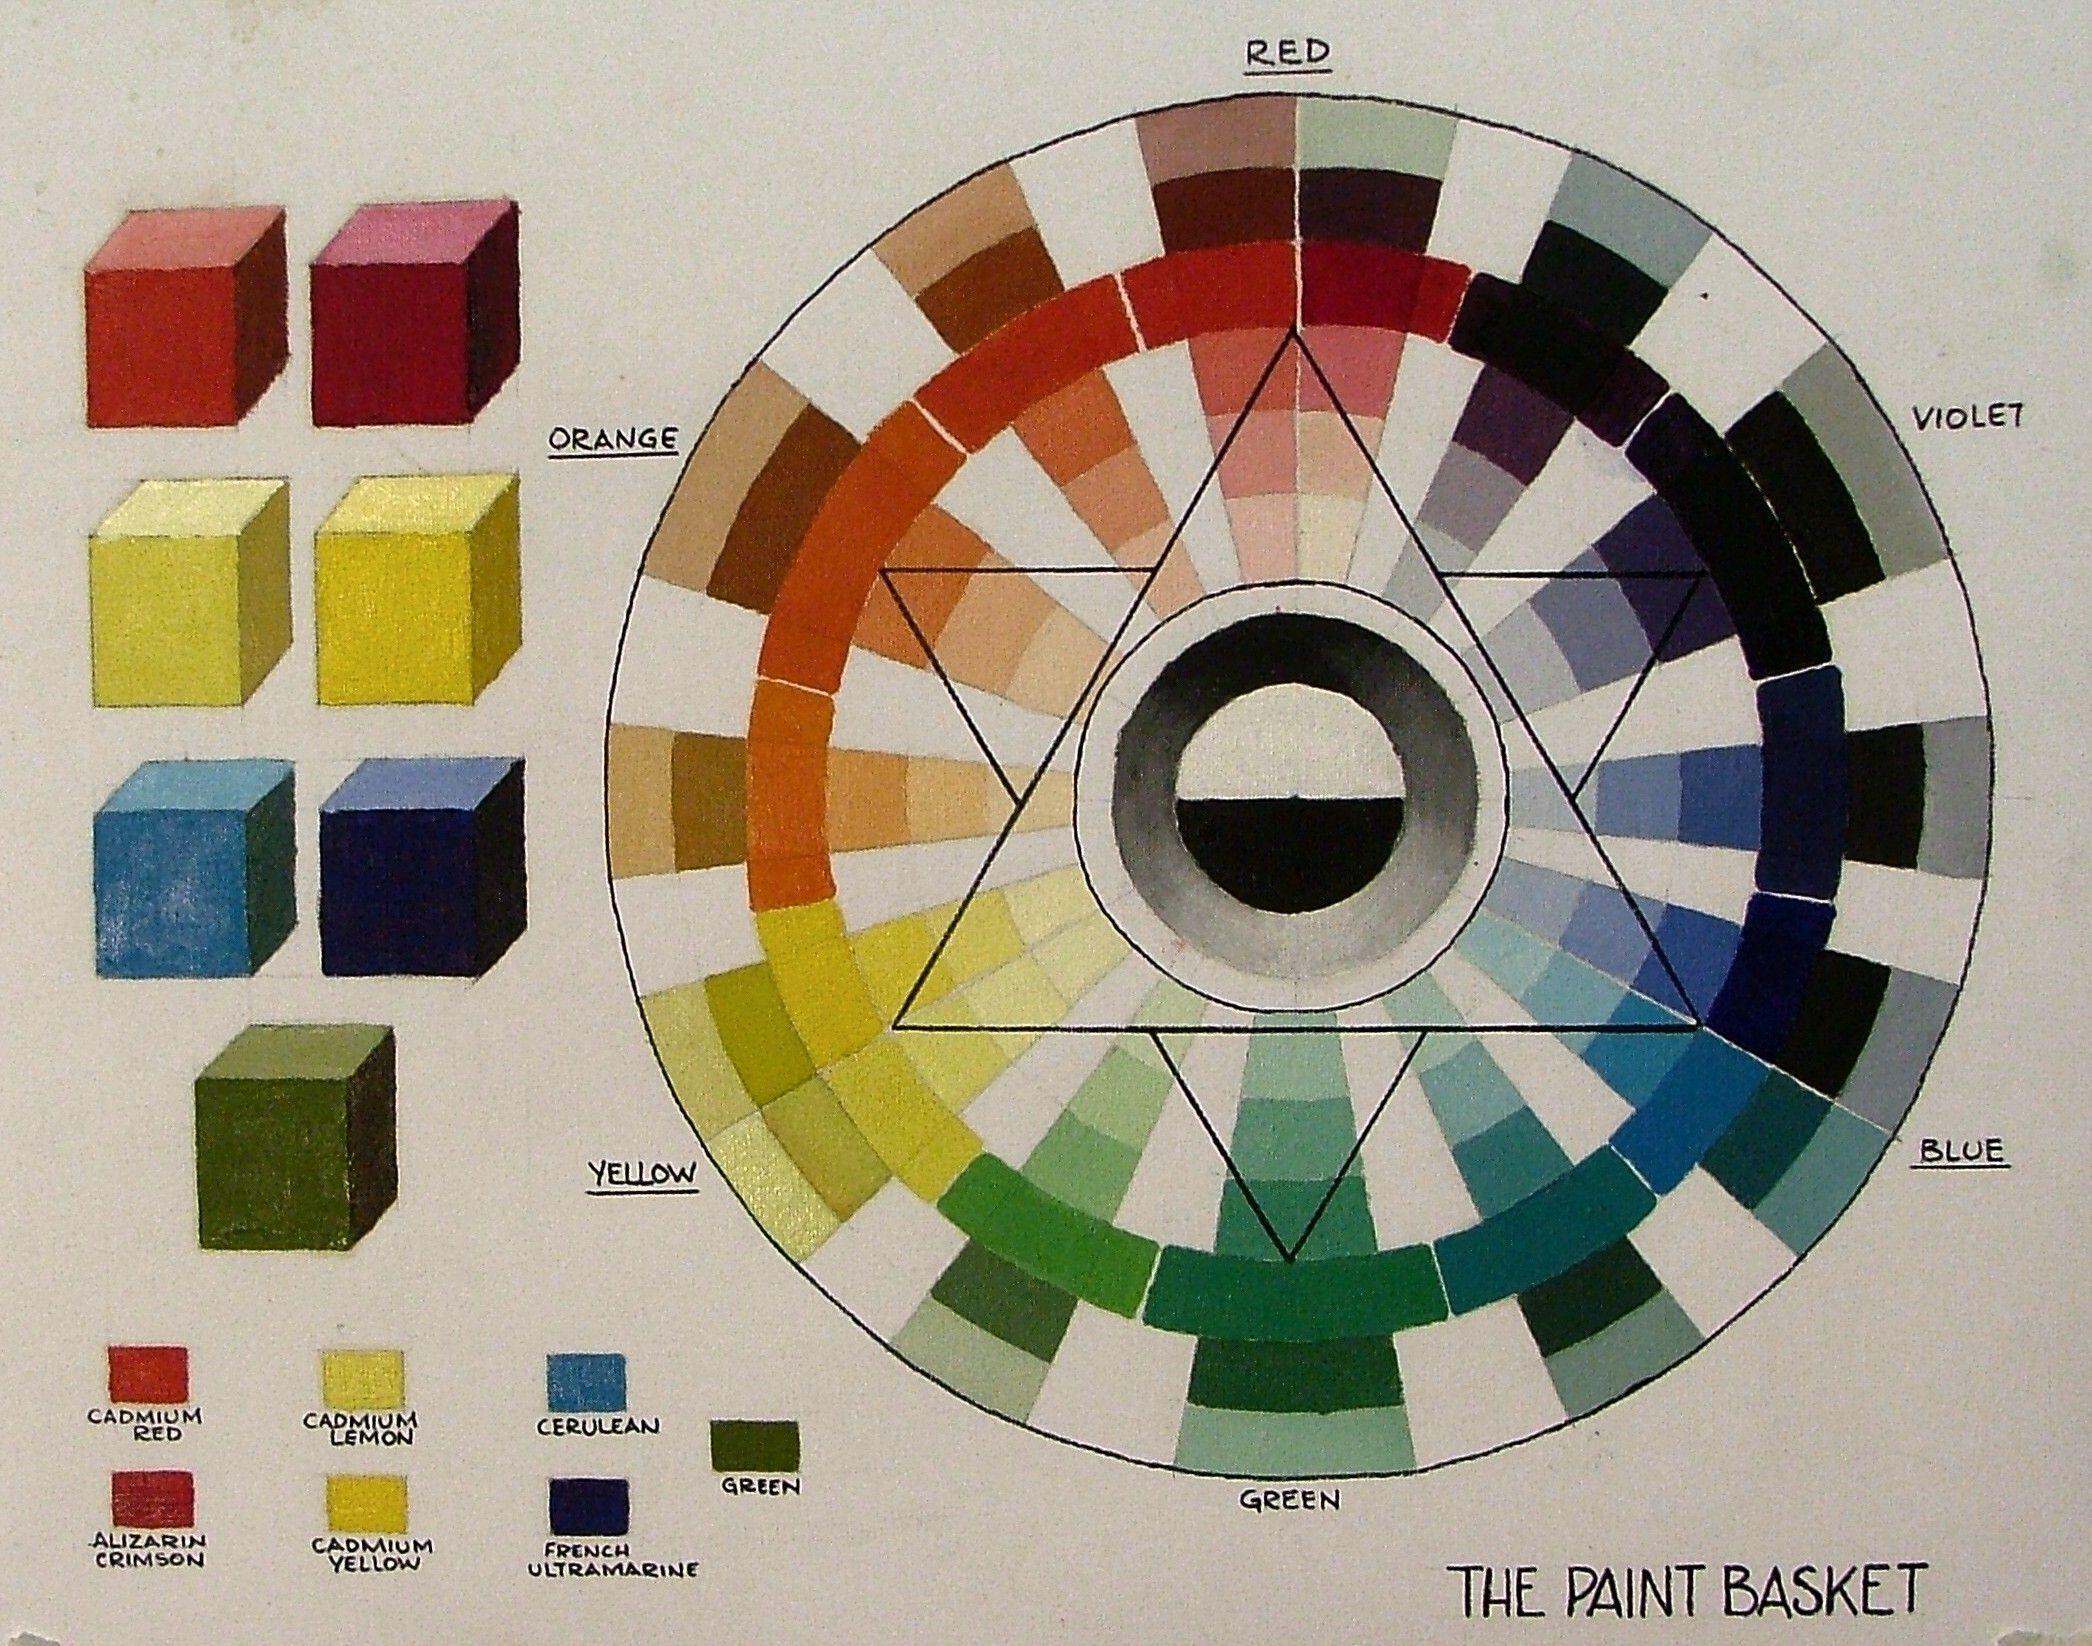 474 best images about Color Wheels on Pinterest | Watercolors ...